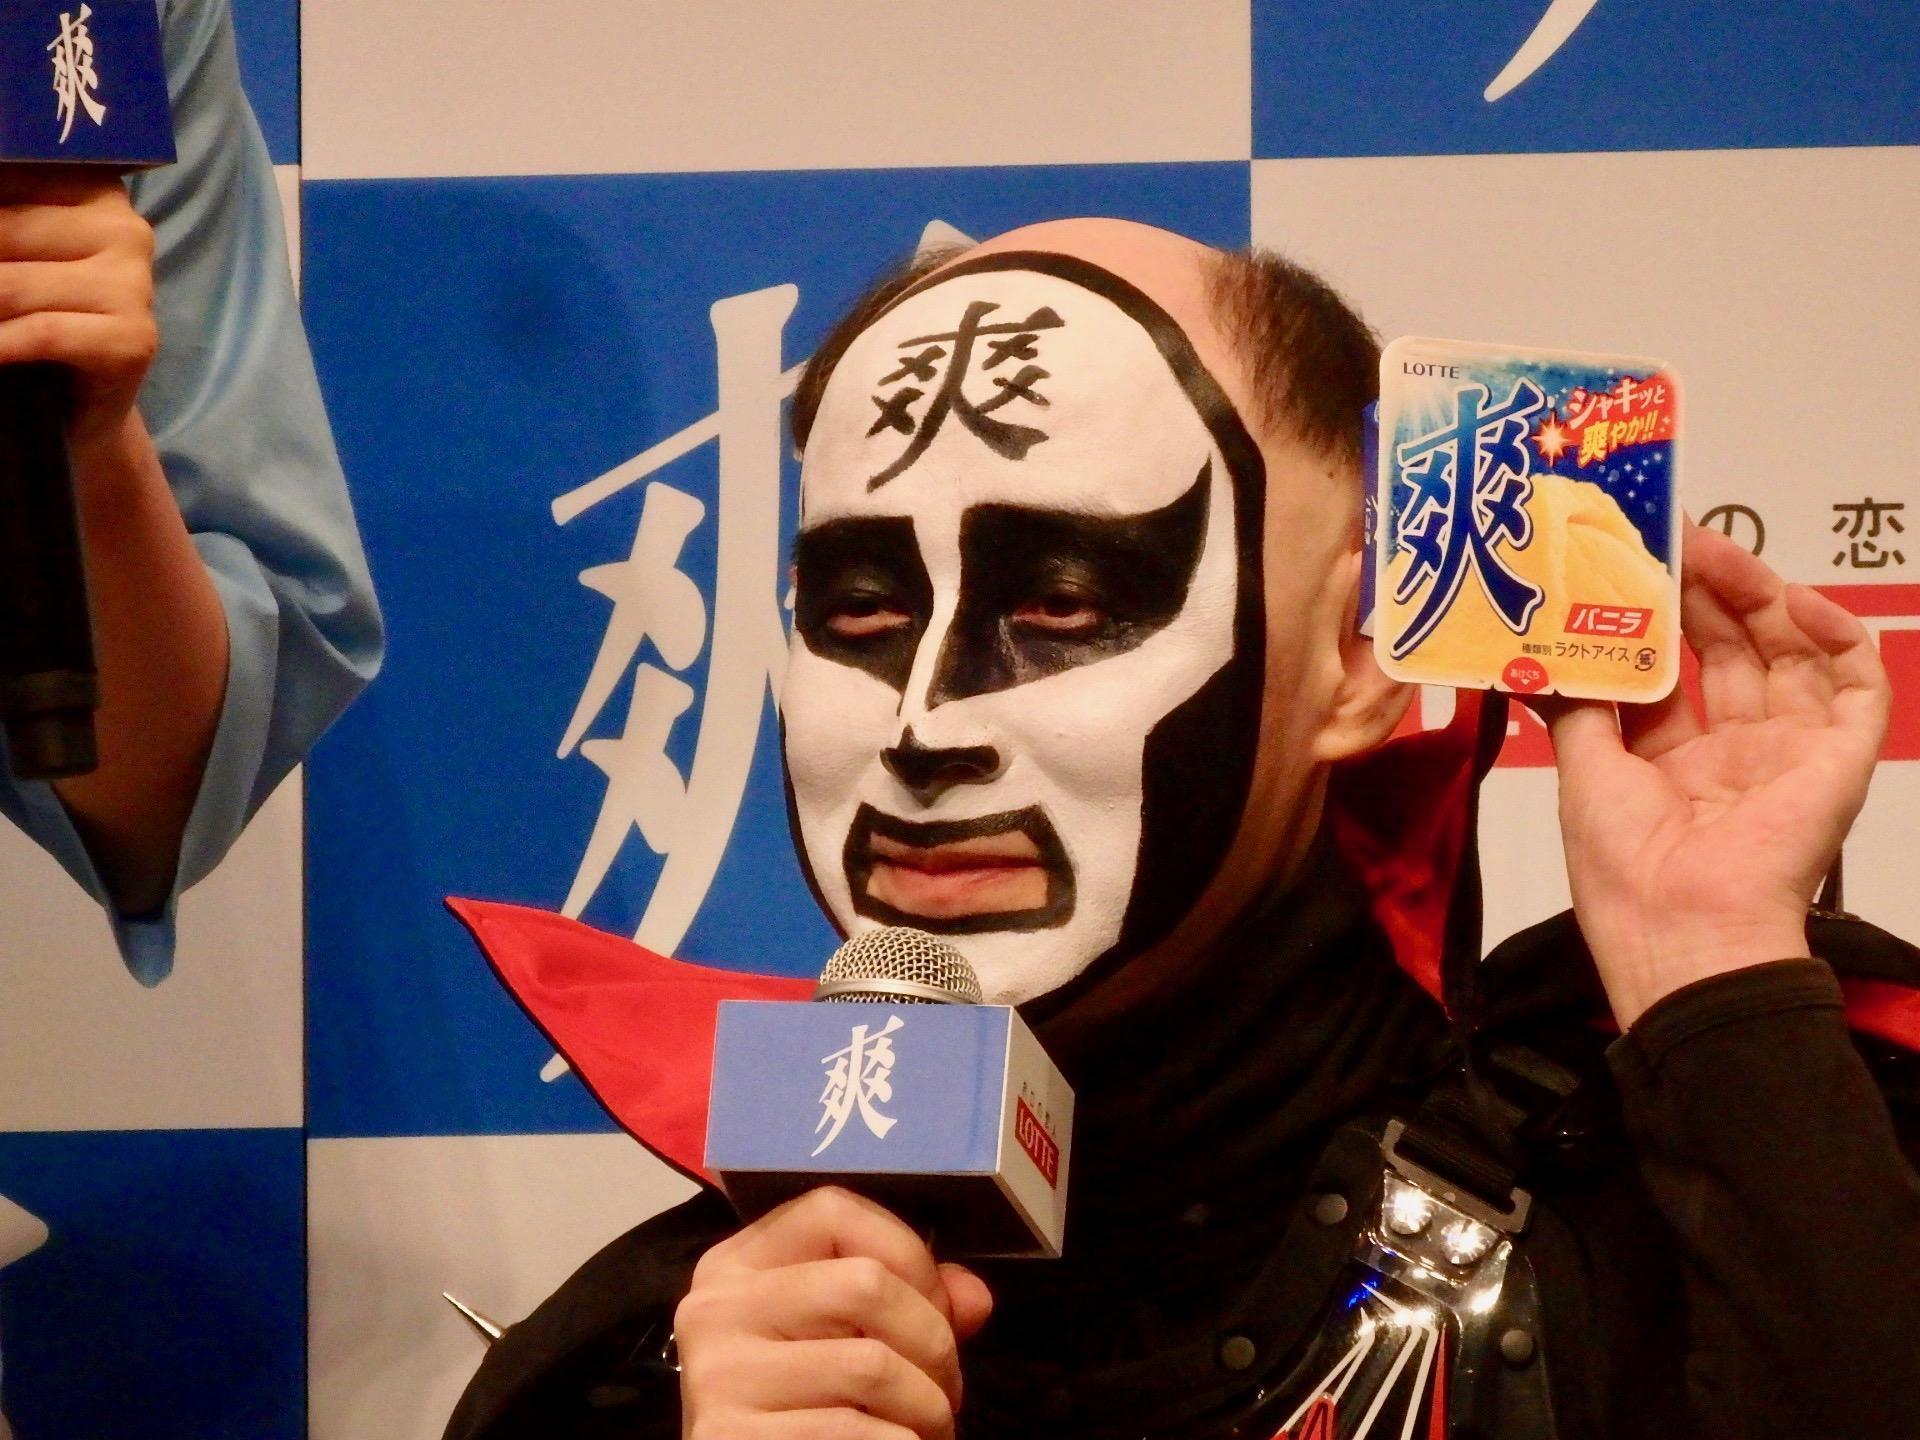 http://news.yoshimoto.co.jp/20180612212620-68242a19570ee71b8dc0efeeb39883bb251ace7e.jpg